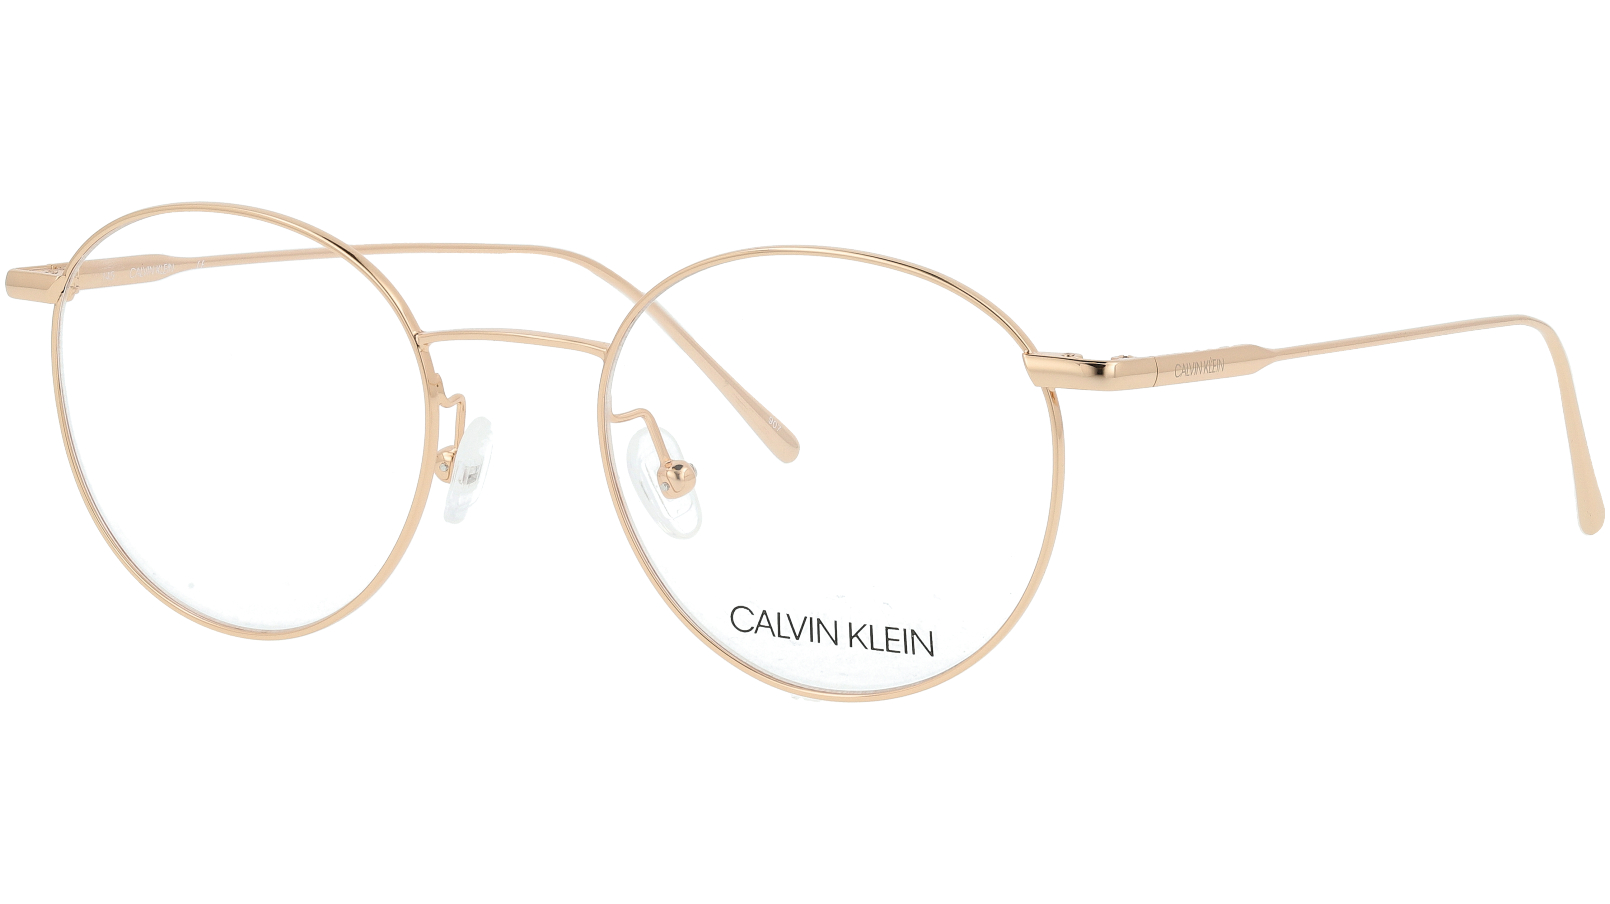 Calvin Klein CK5460 780 49 Gold Glasses